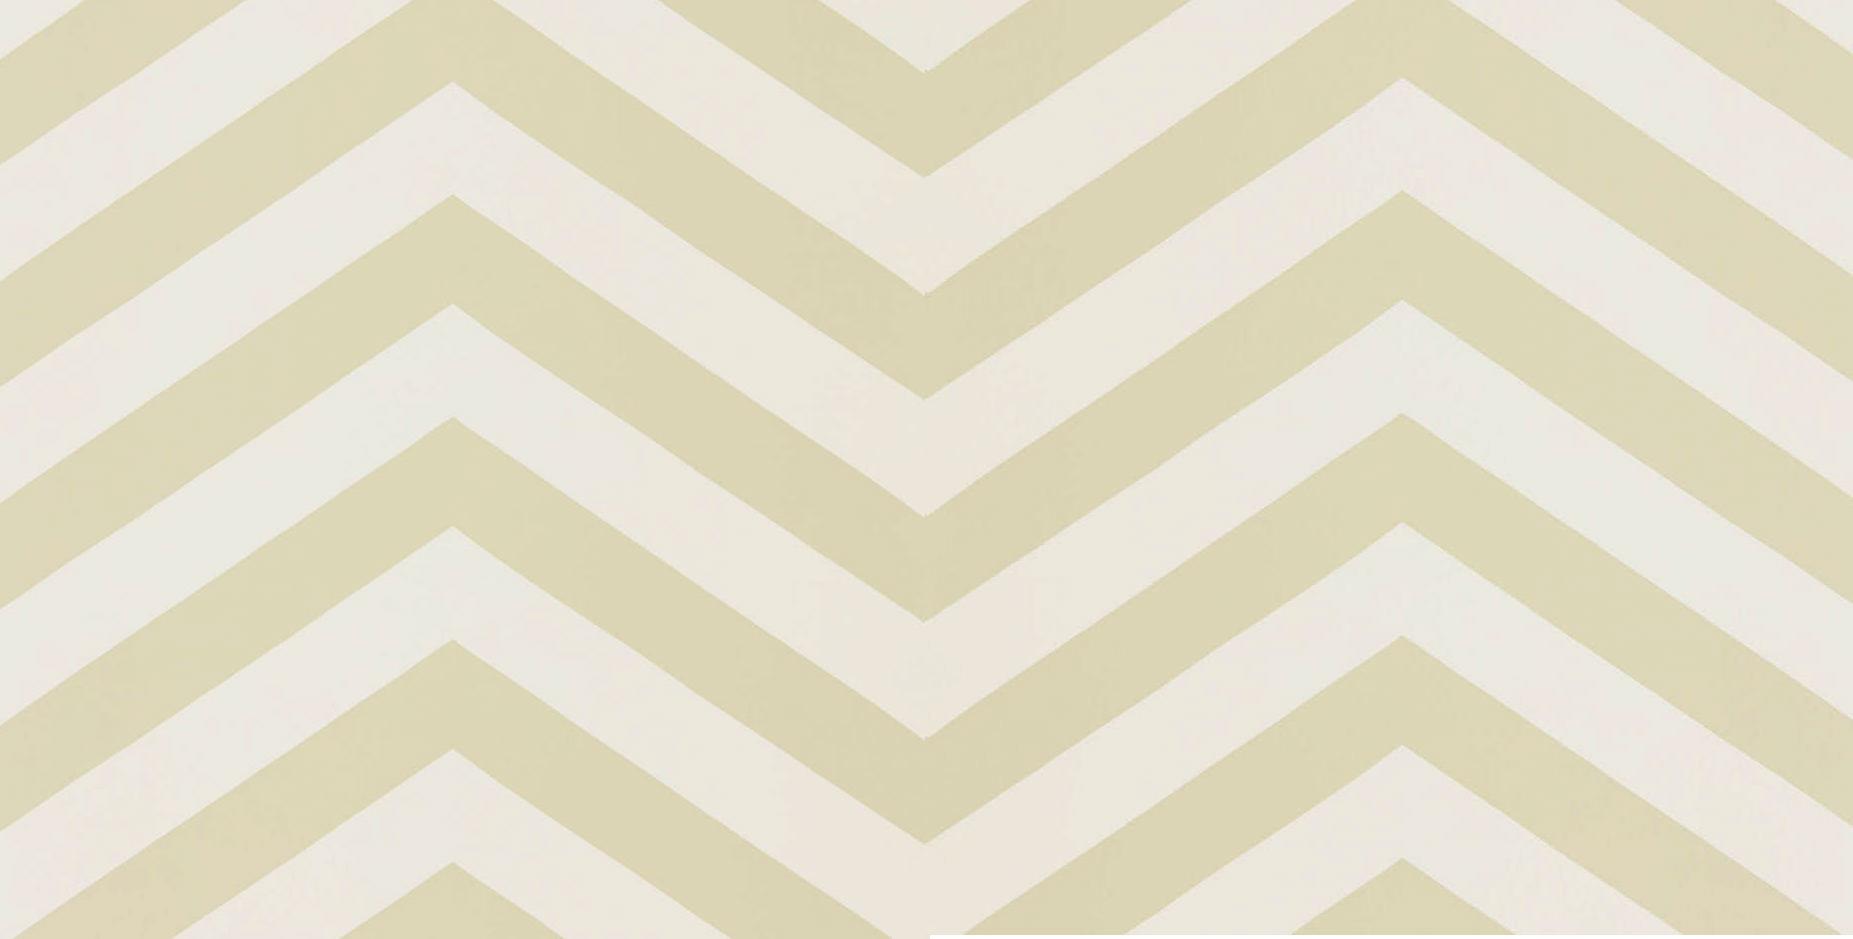 Tienda online telas papel papel pared rayas zigzag lino - Papel pared rayas ...